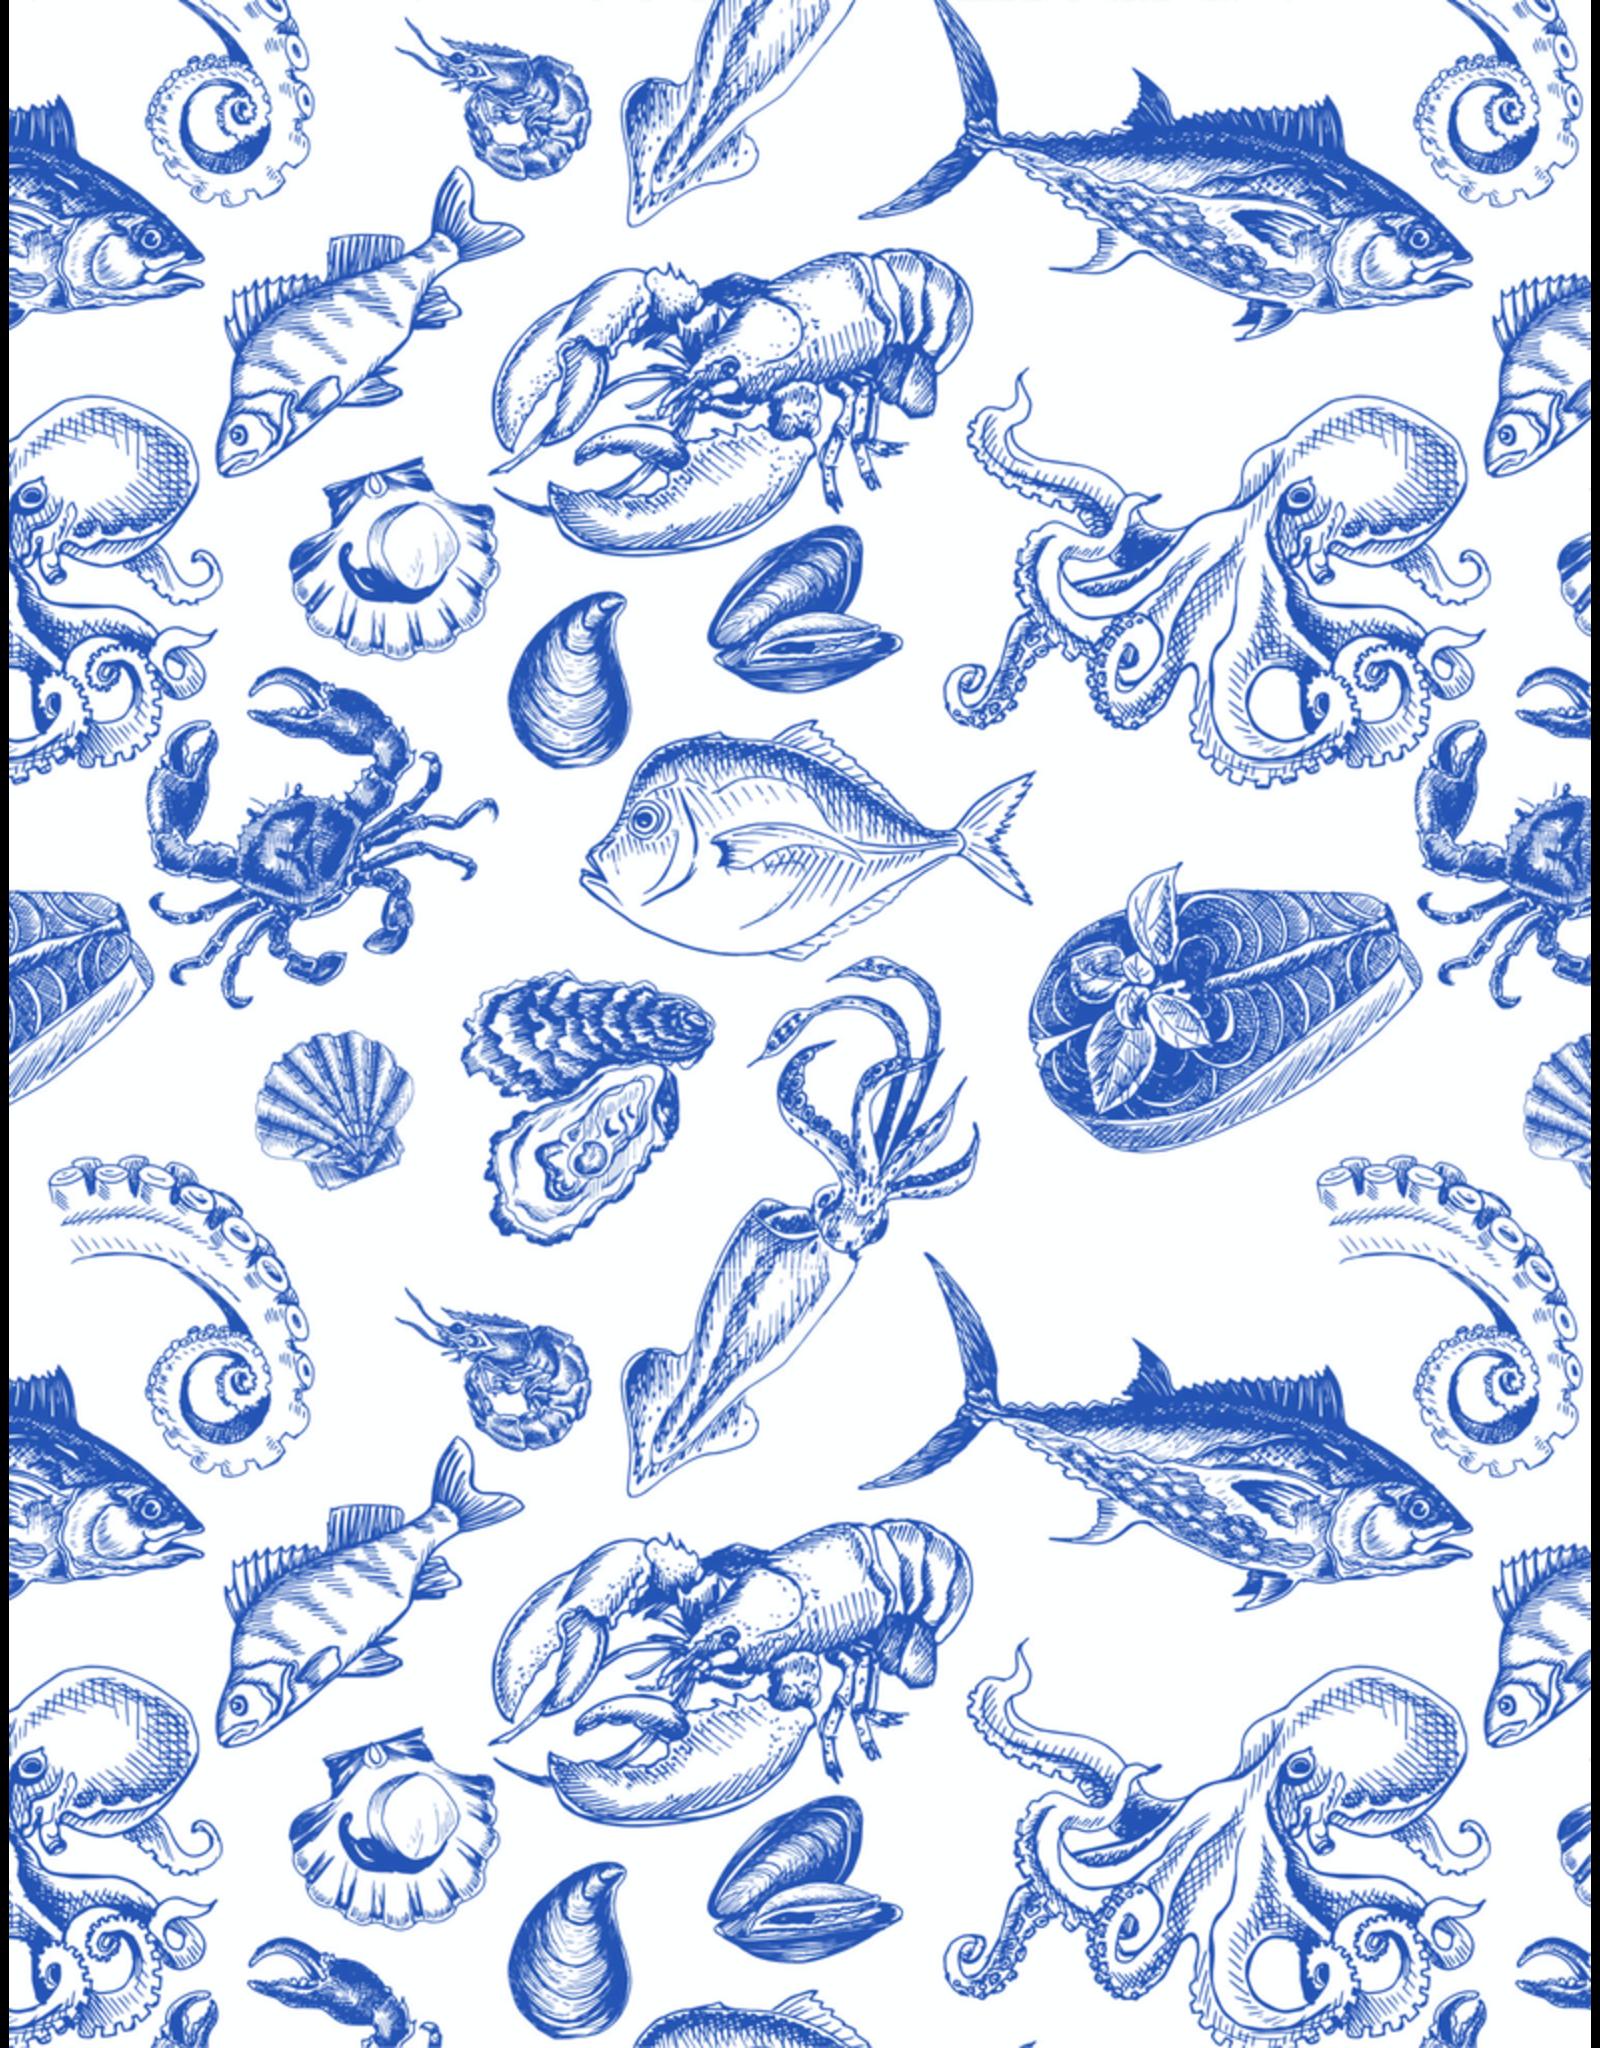 Sanbao Ocean – Shellfish (underglaze decal - 16cm x 22cm)